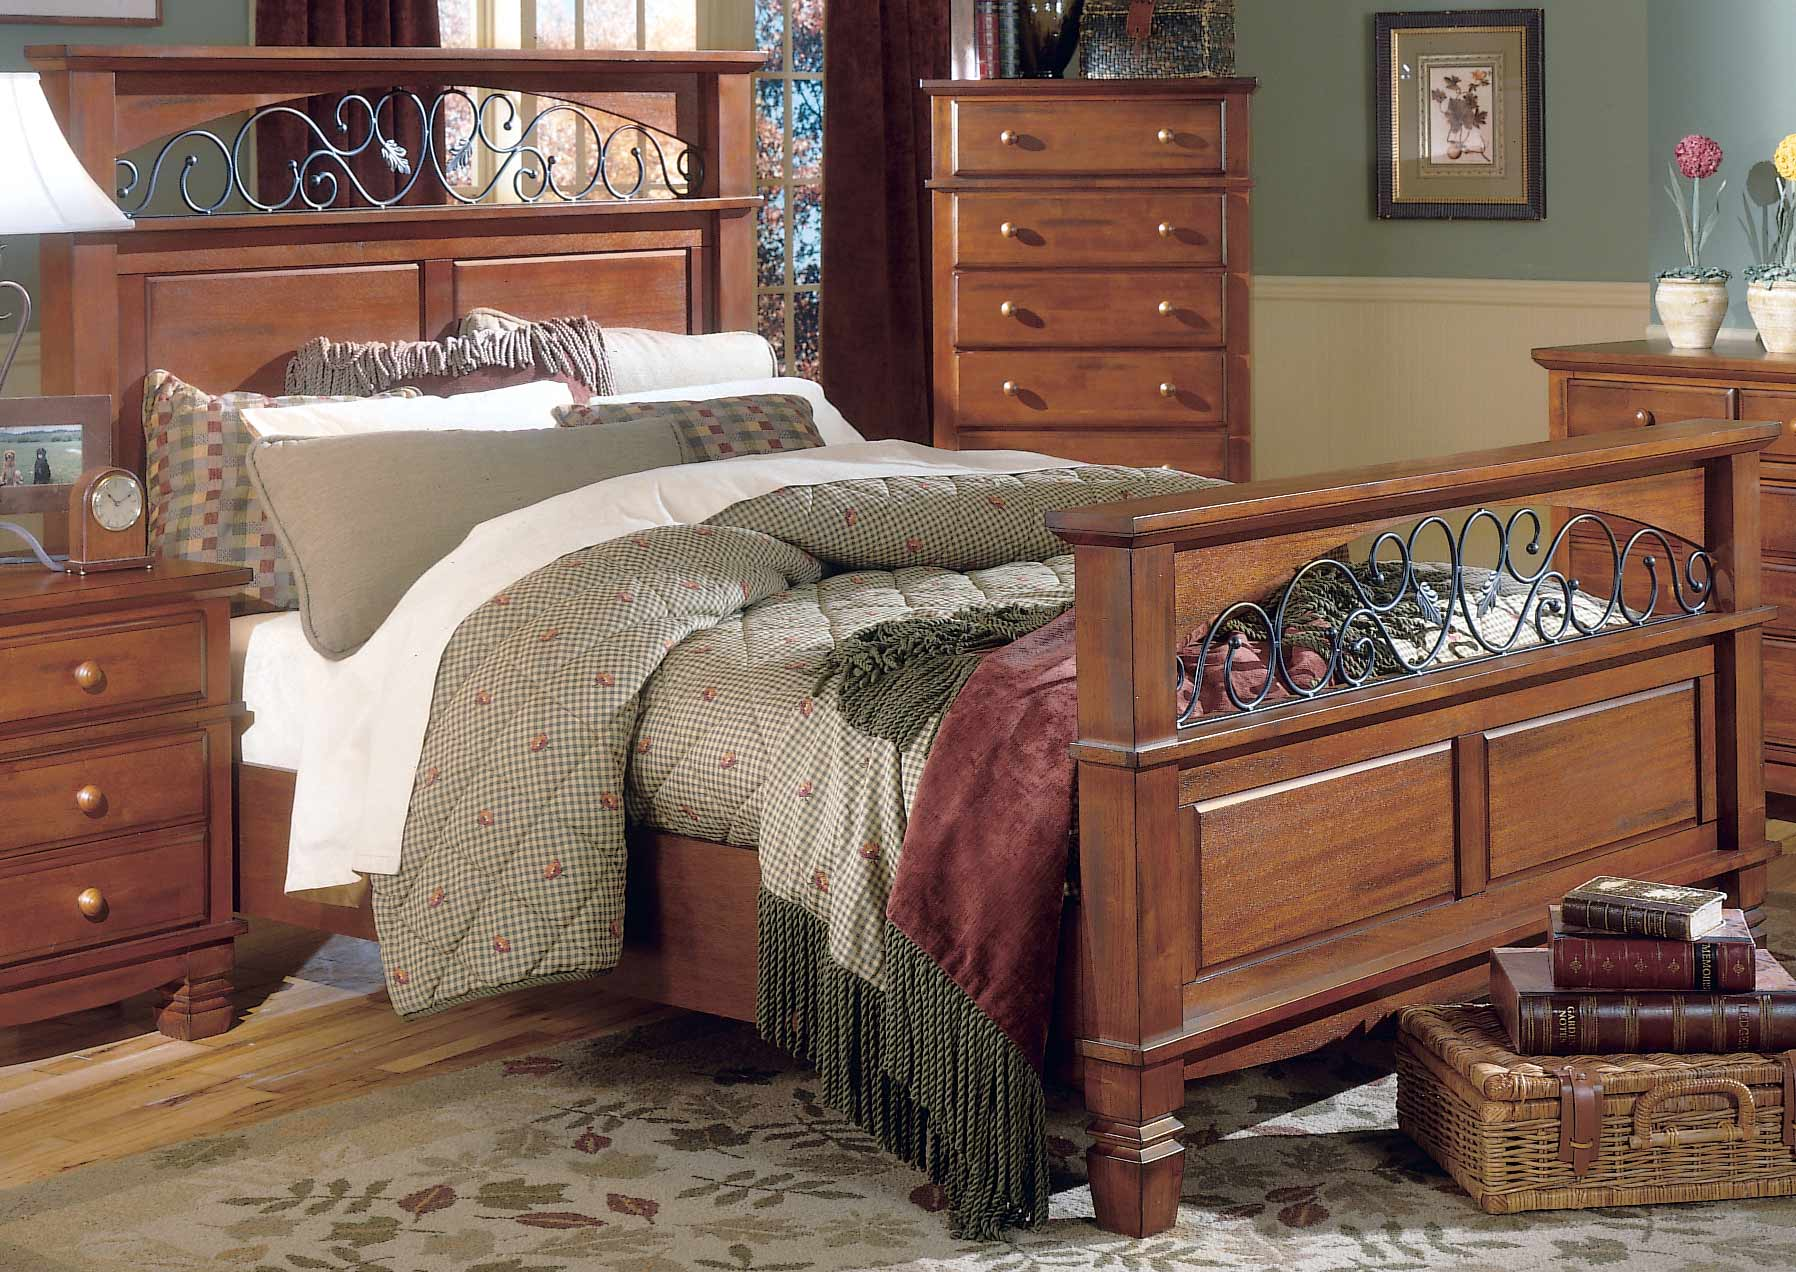 Homelegance Lareto Bed with Wood Rails